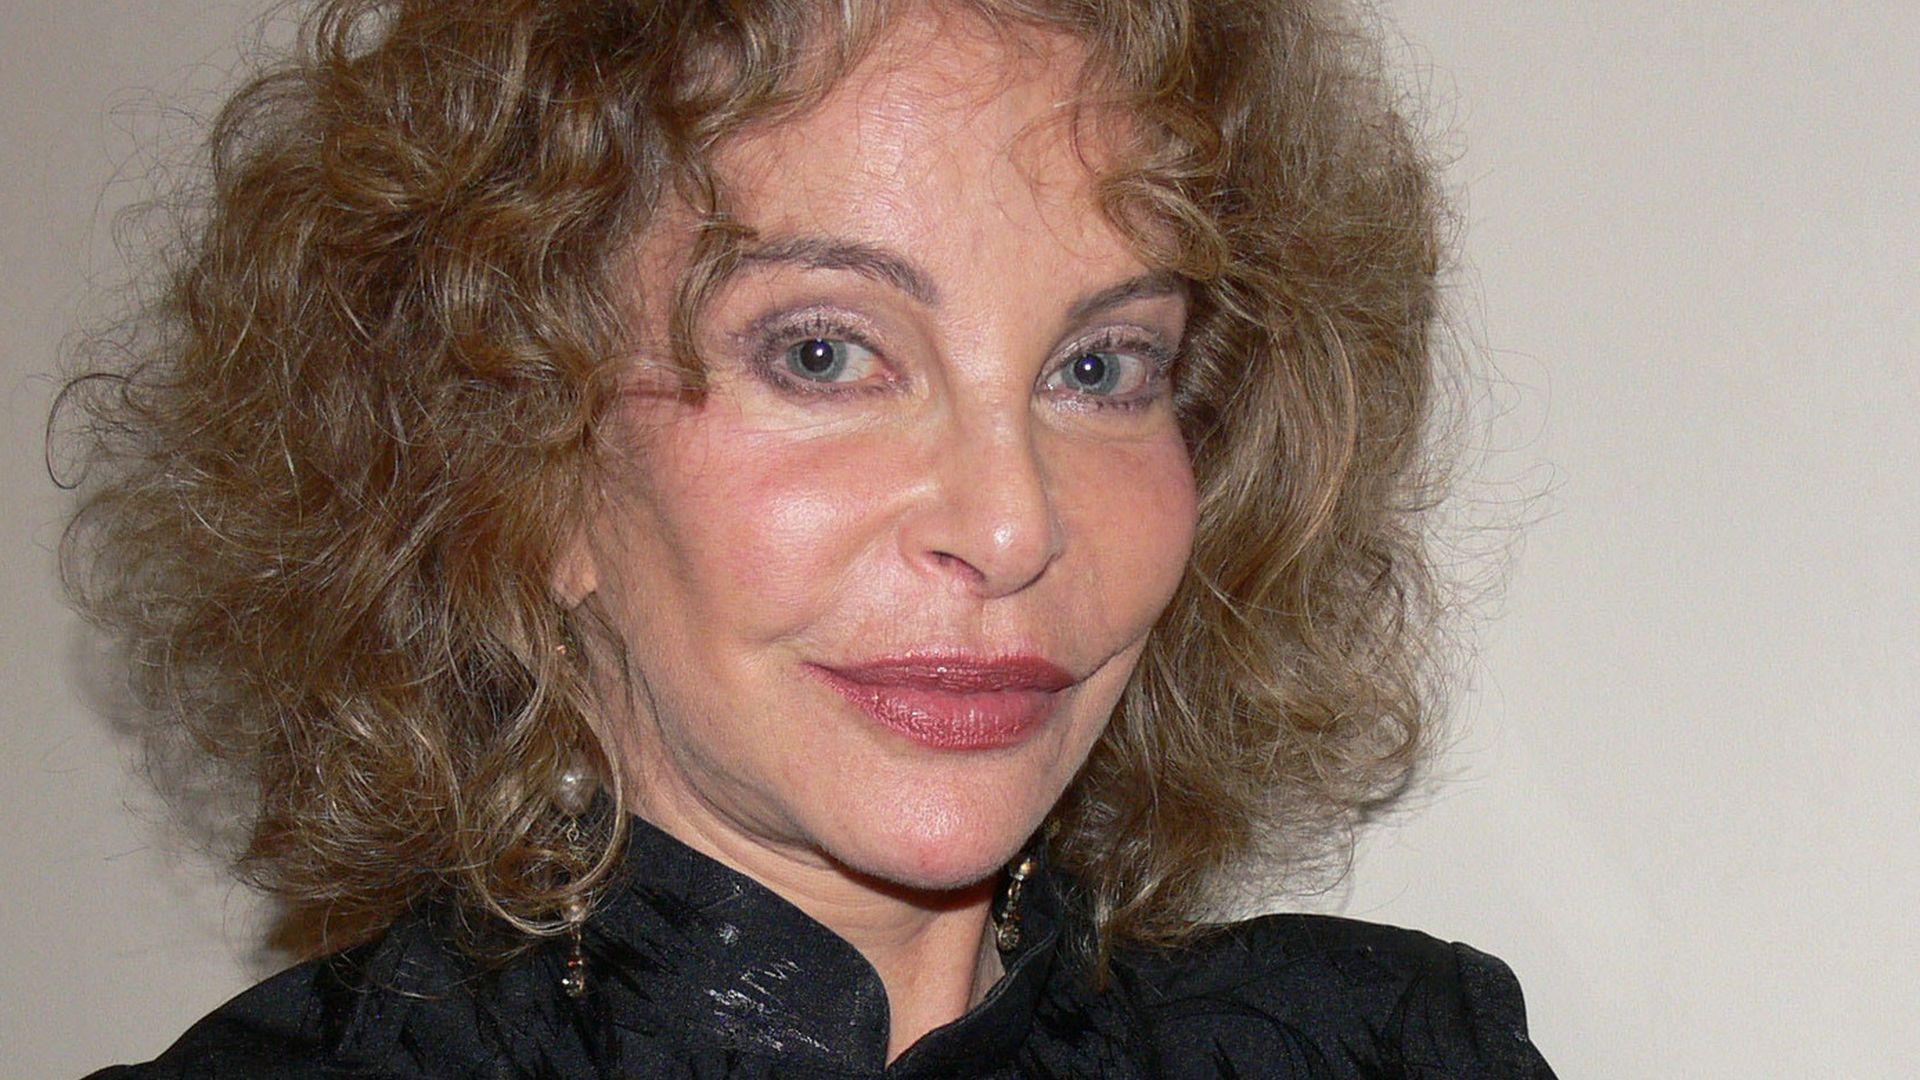 Phyllis Newman Porno pics & movies Dana Wheeler-Nicholson,Christina Hendricks